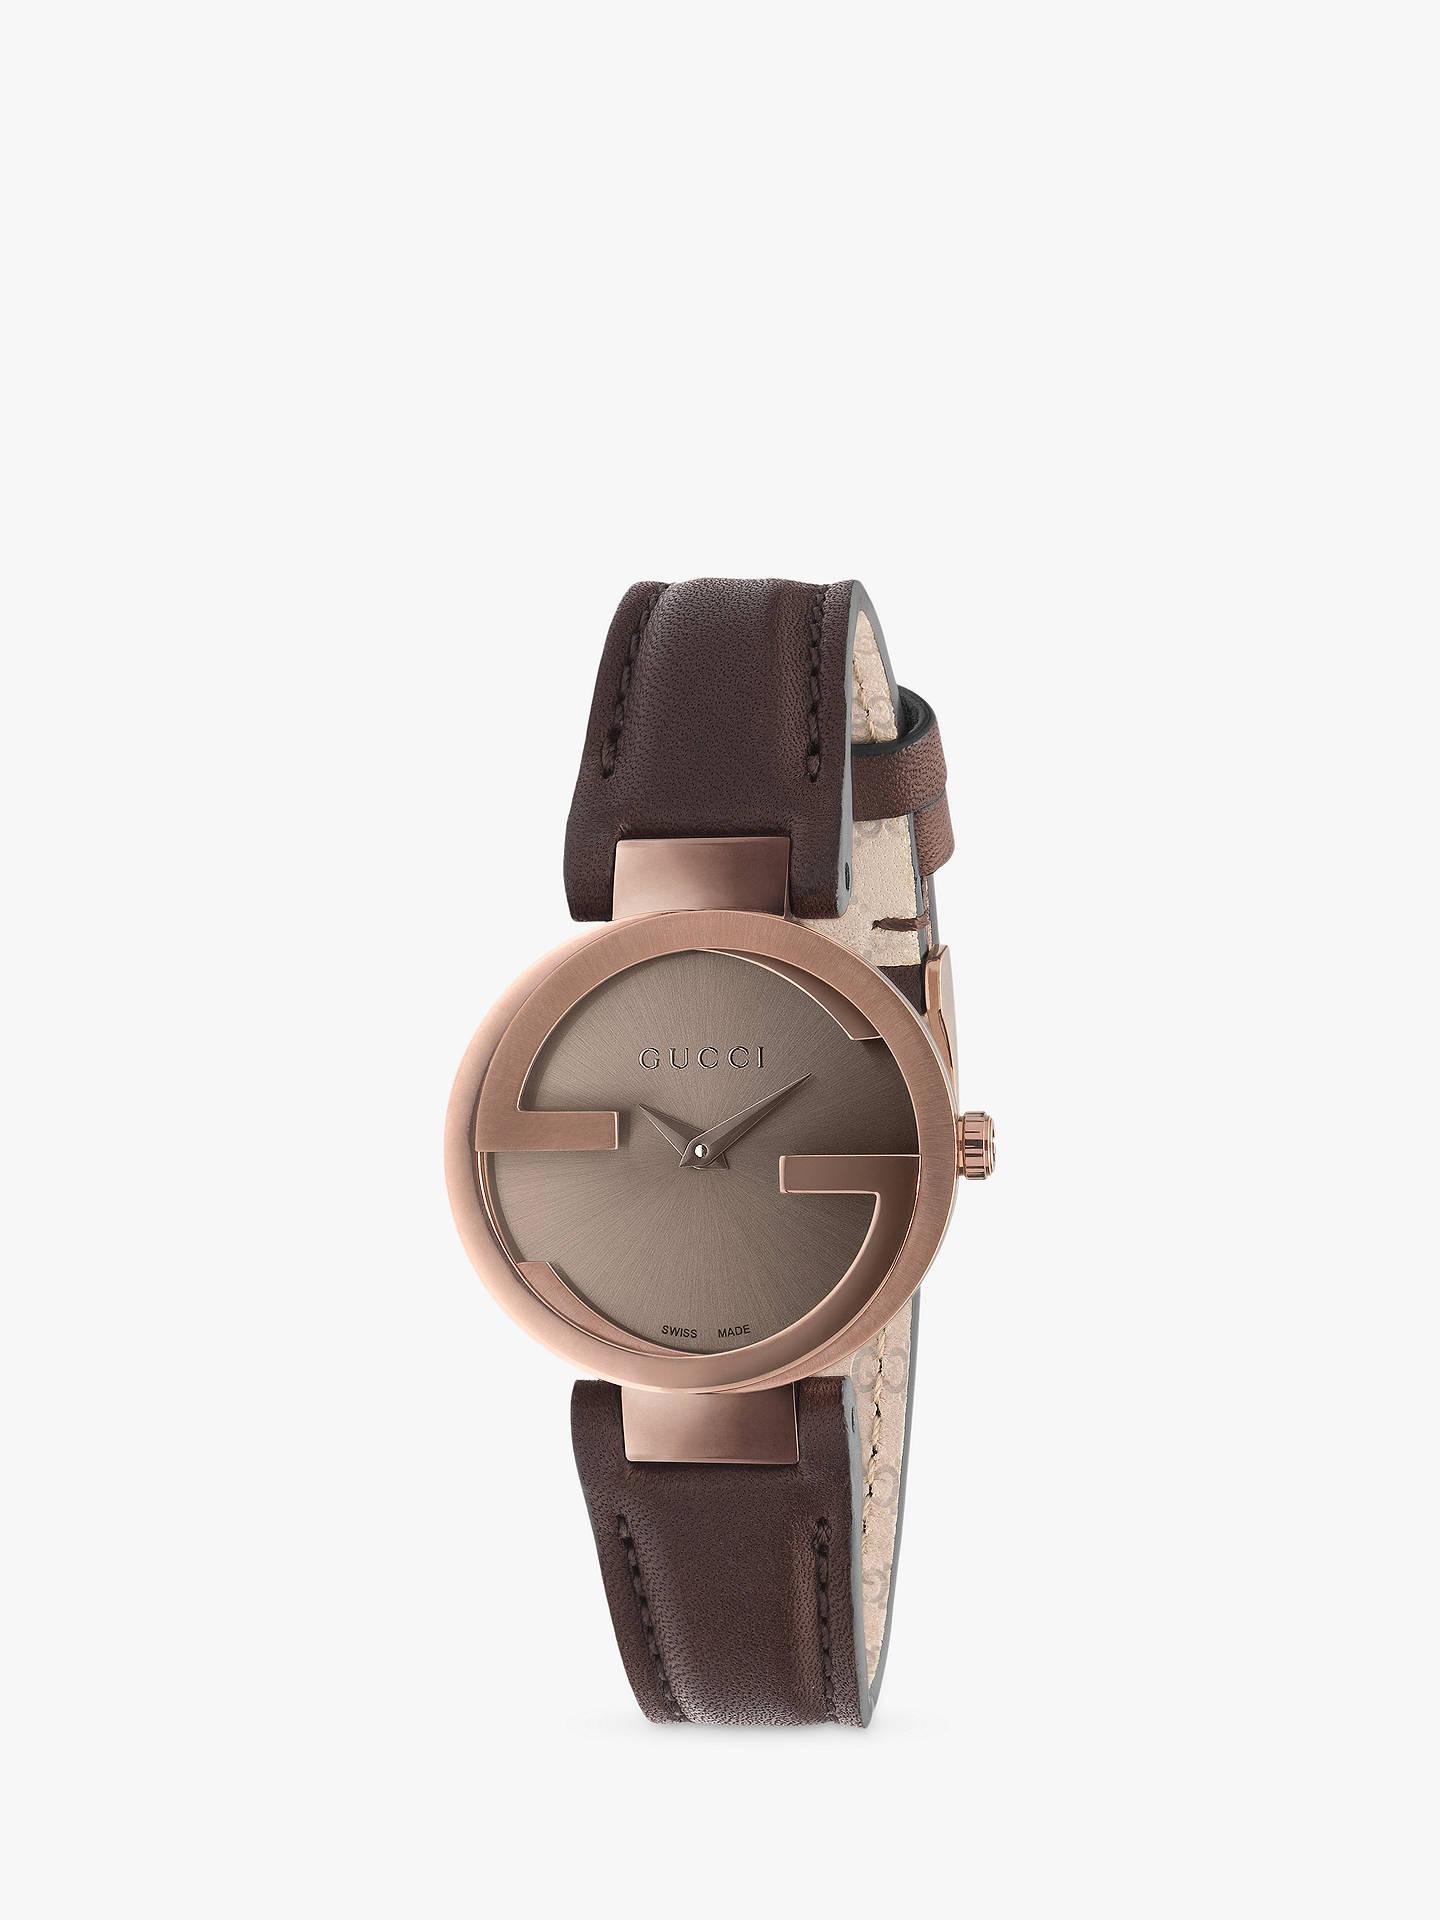 2dcde5b0406 Buy Gucci YA133504 Women s Interlocking G Leather Strap Watch